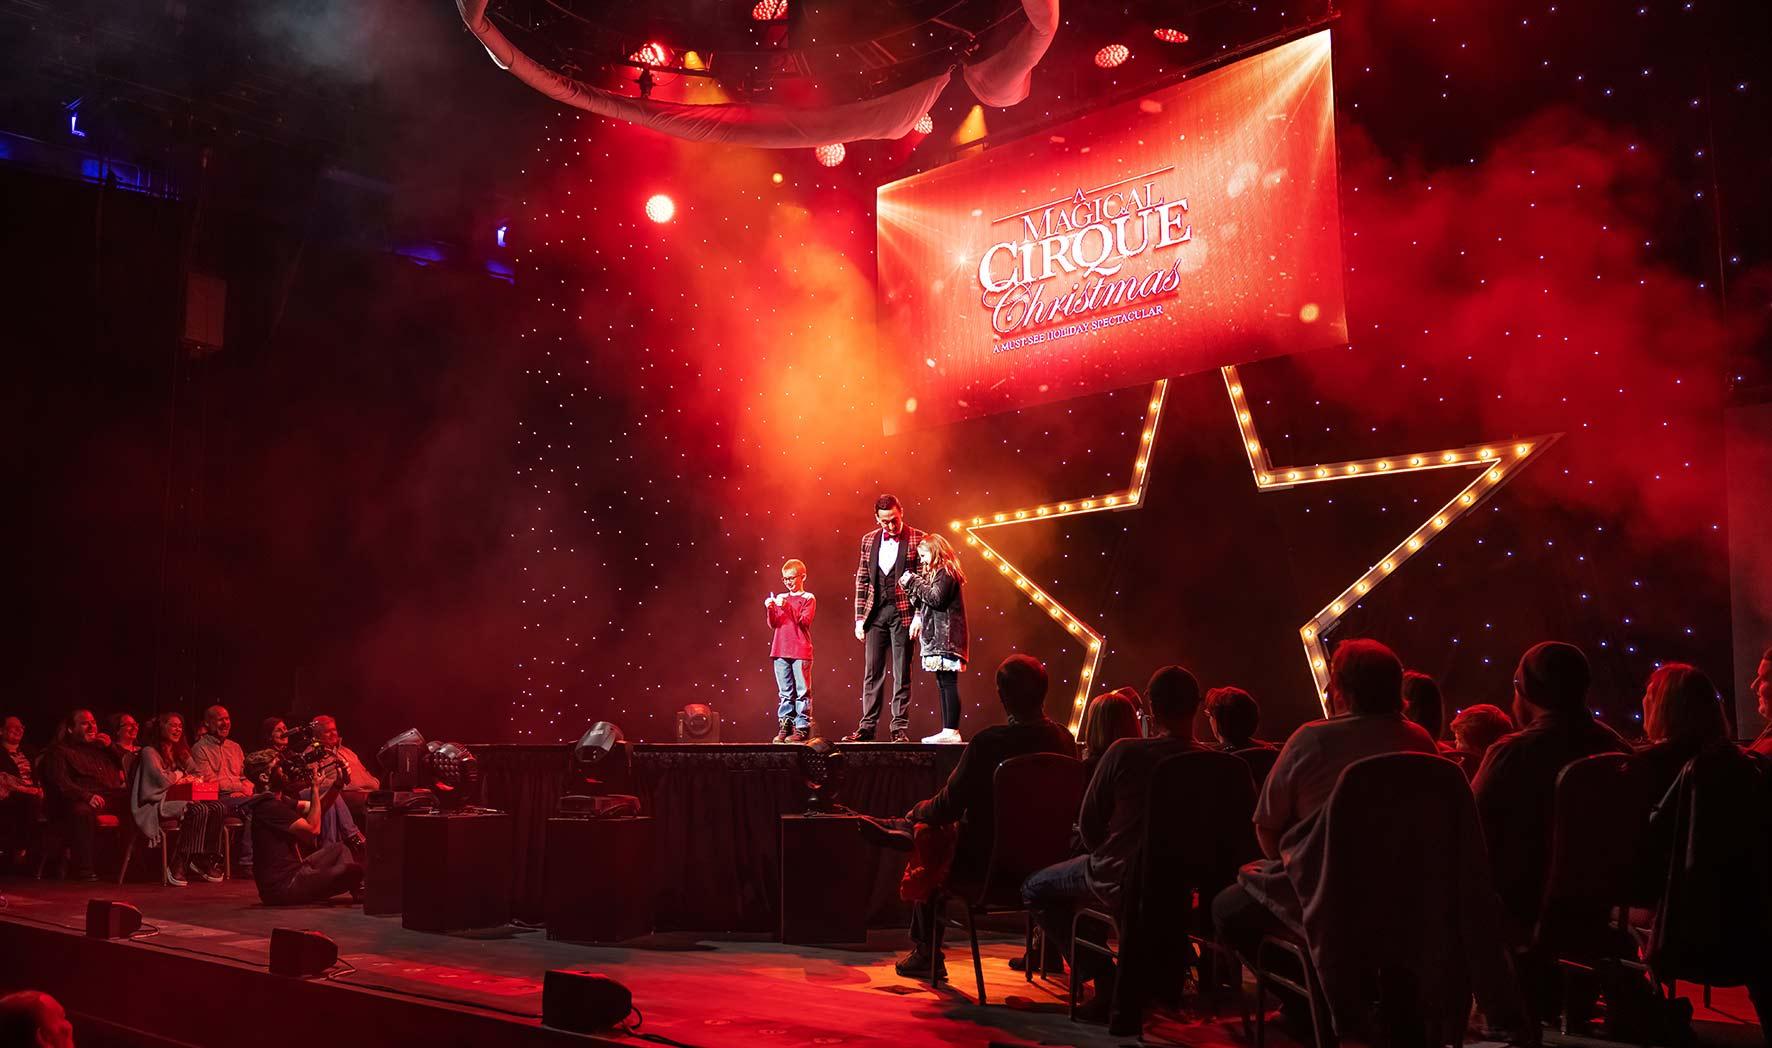 A Magical Cirque Christmas.A Magical Cirque Christmas Columbus Association For The